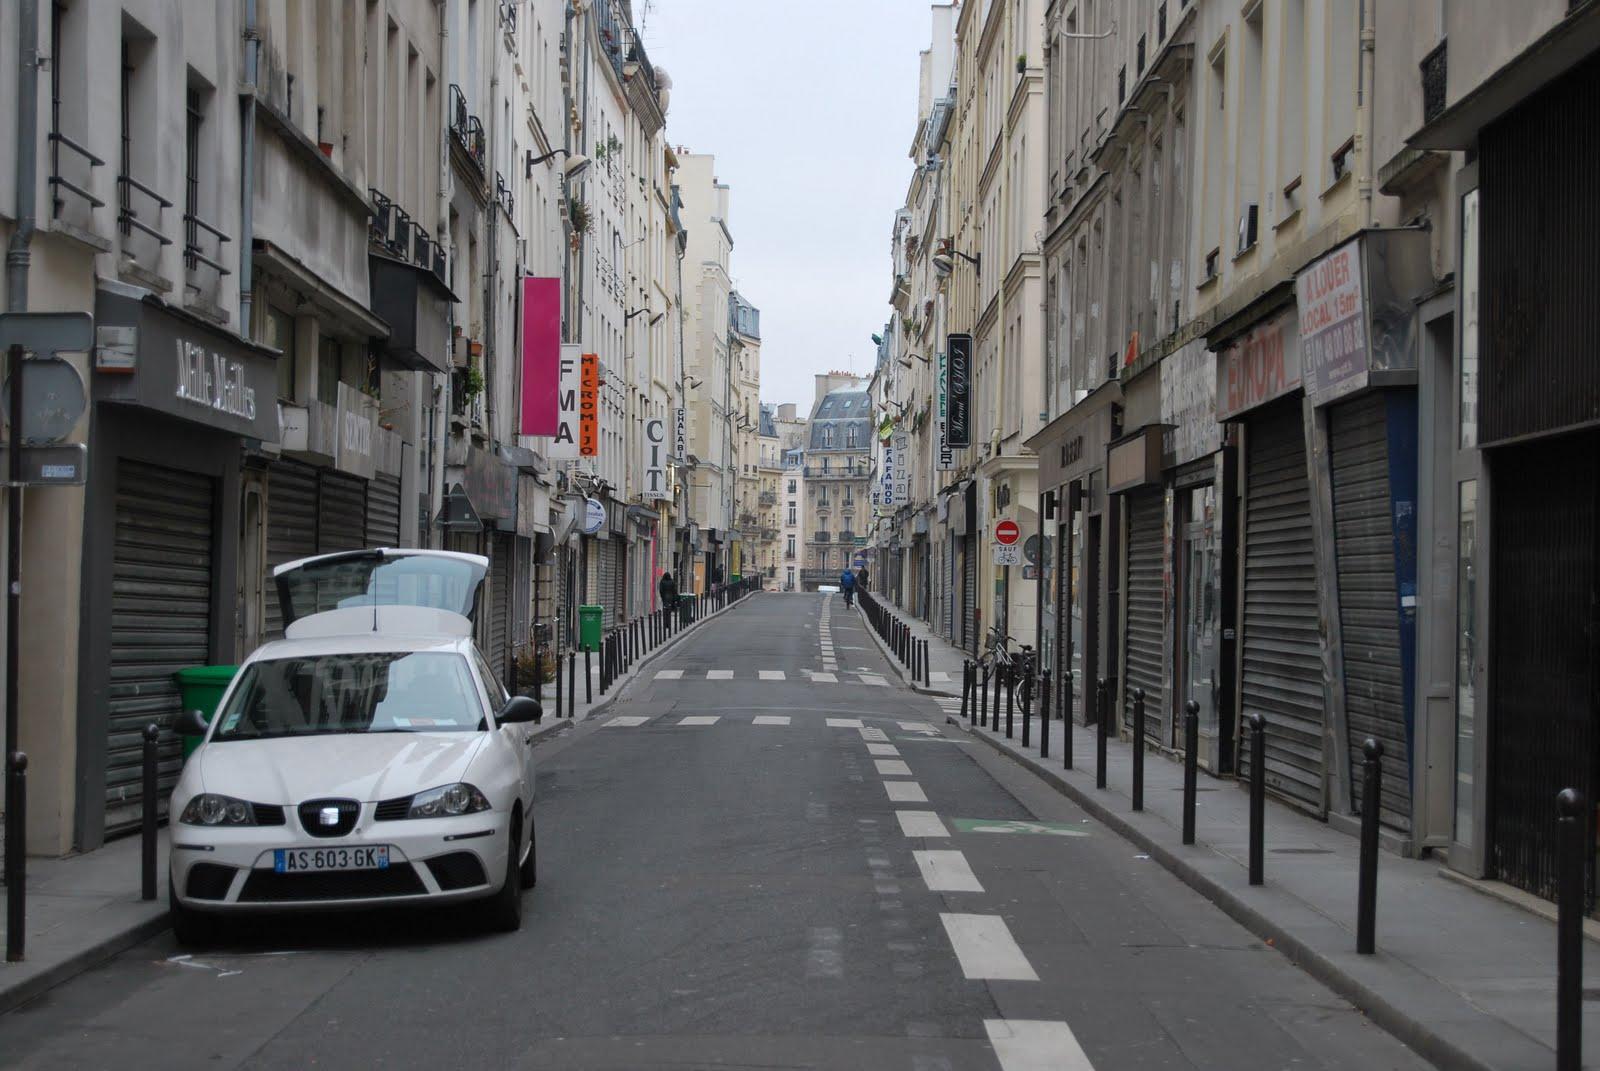 rue pestalozzi le sentier paris 1 le sentier in paris 1. Black Bedroom Furniture Sets. Home Design Ideas